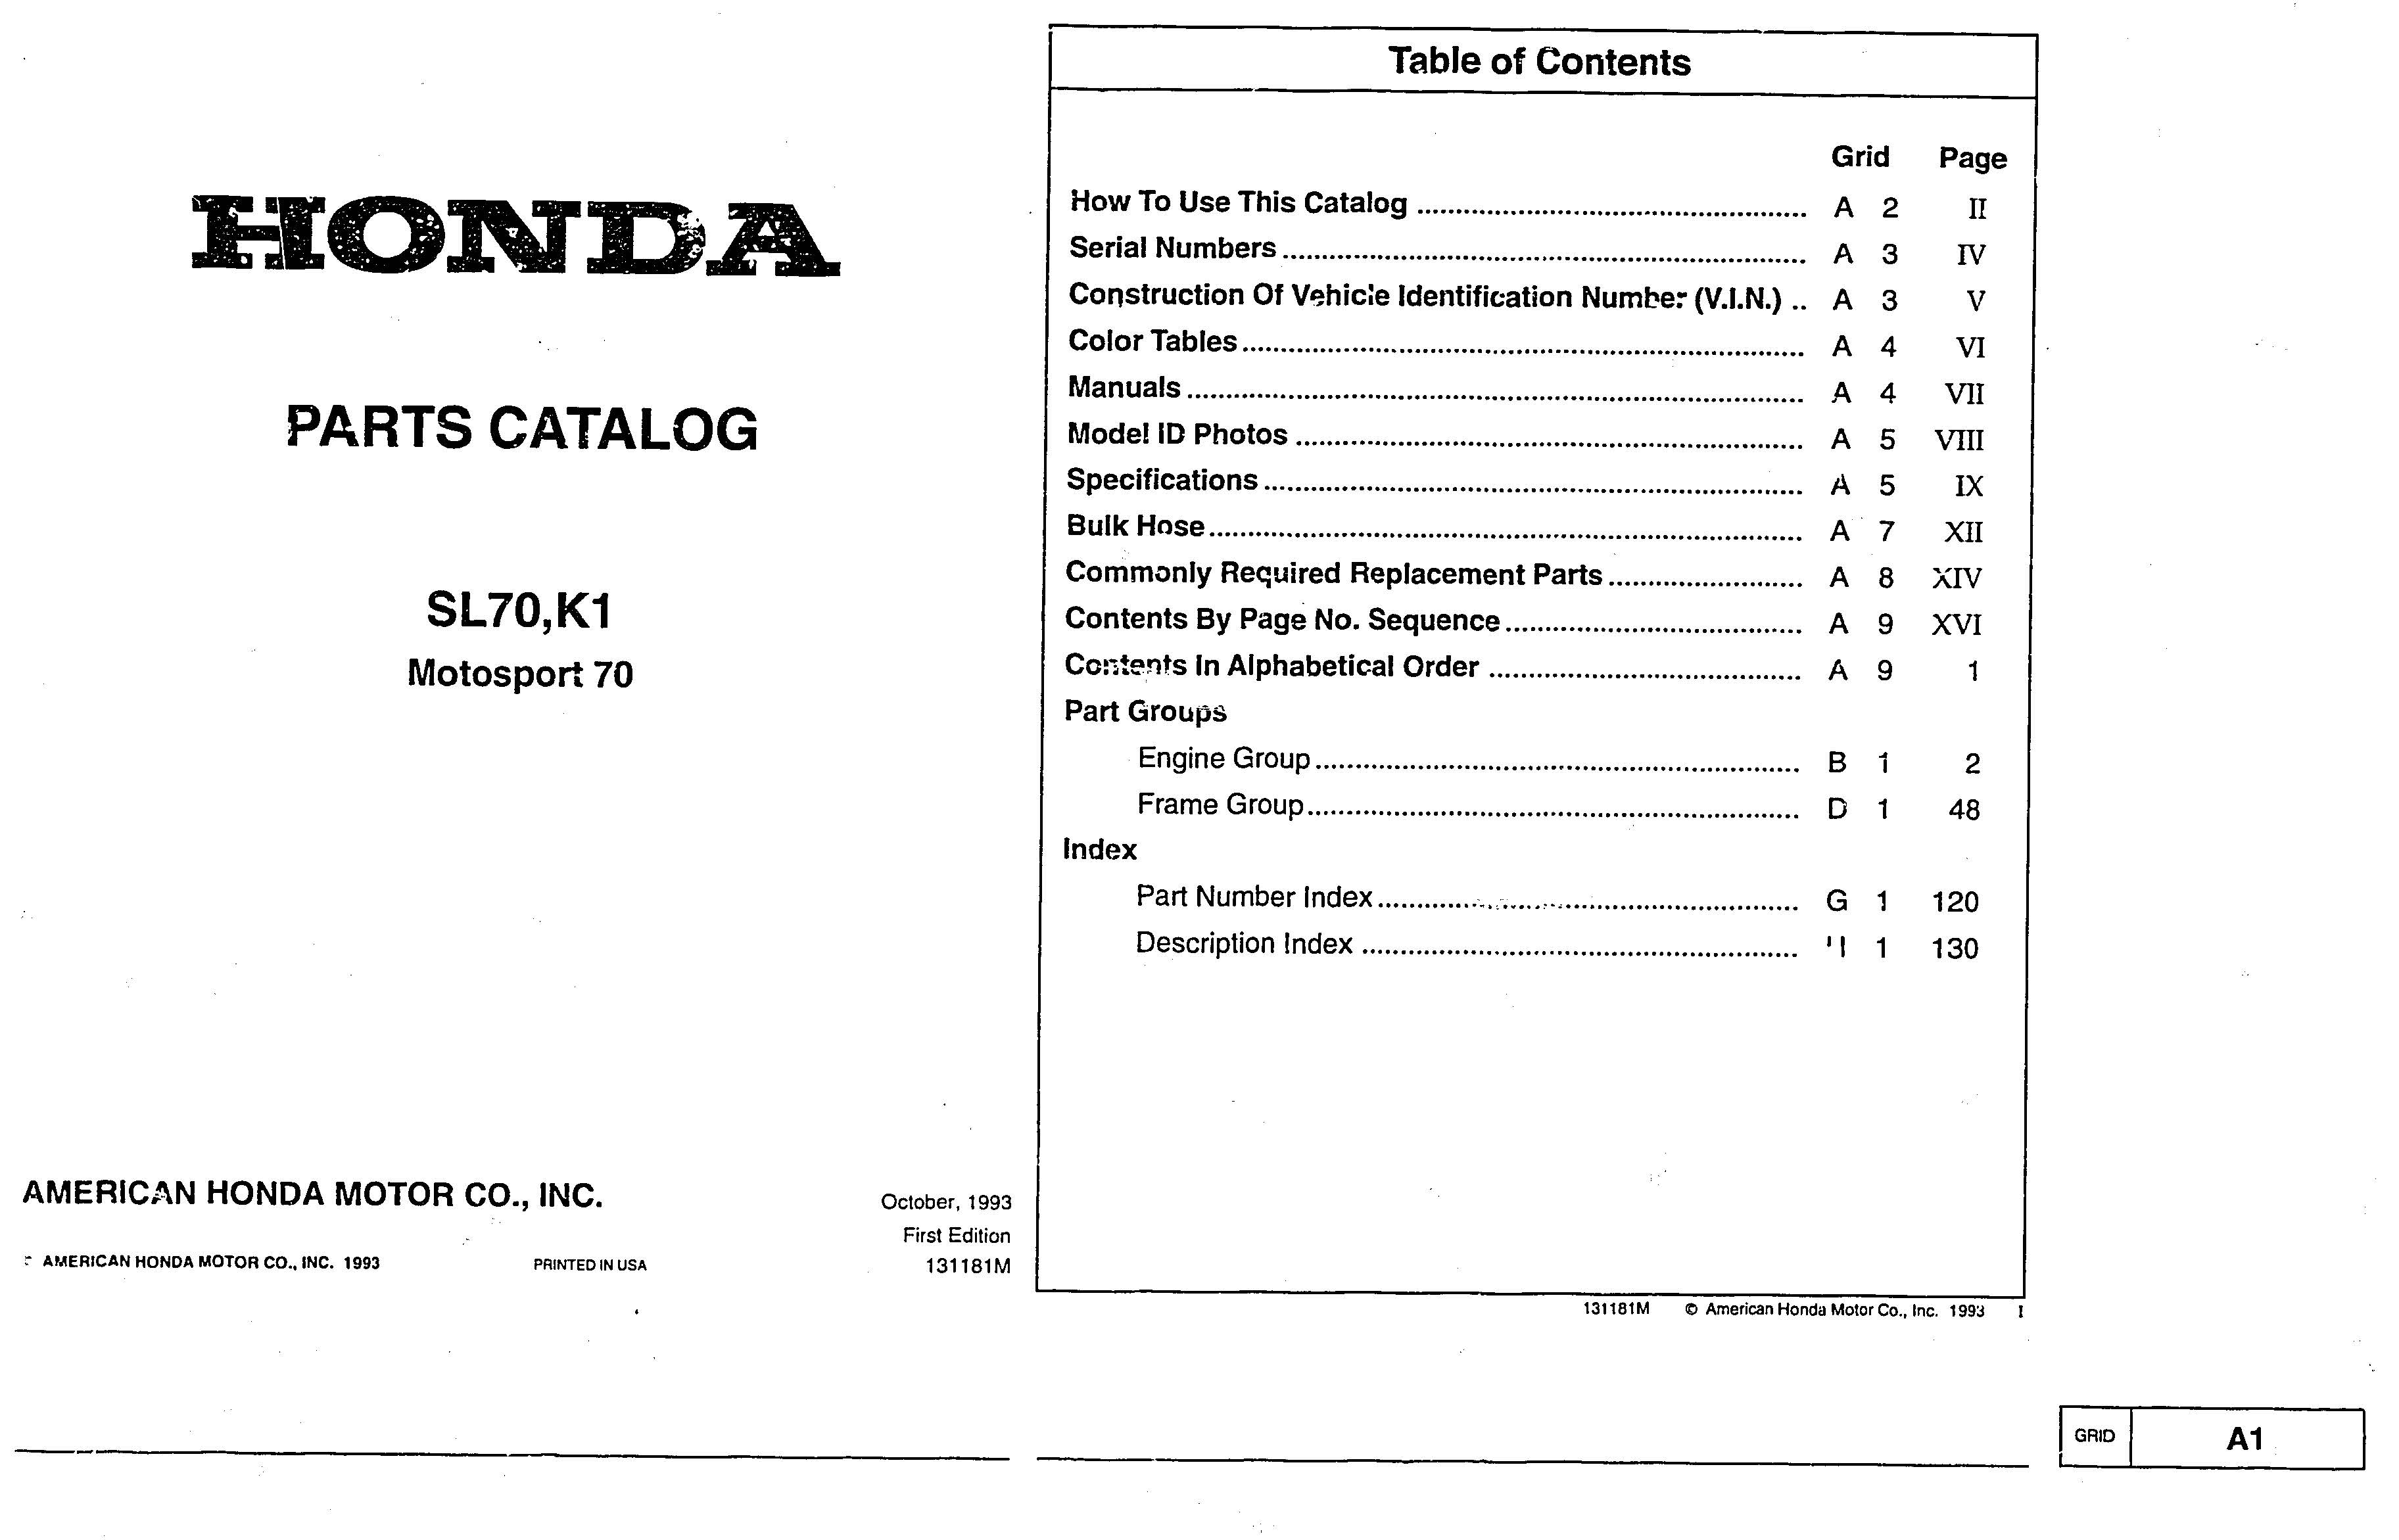 Parts list for Honda SL70 K1 (1993)